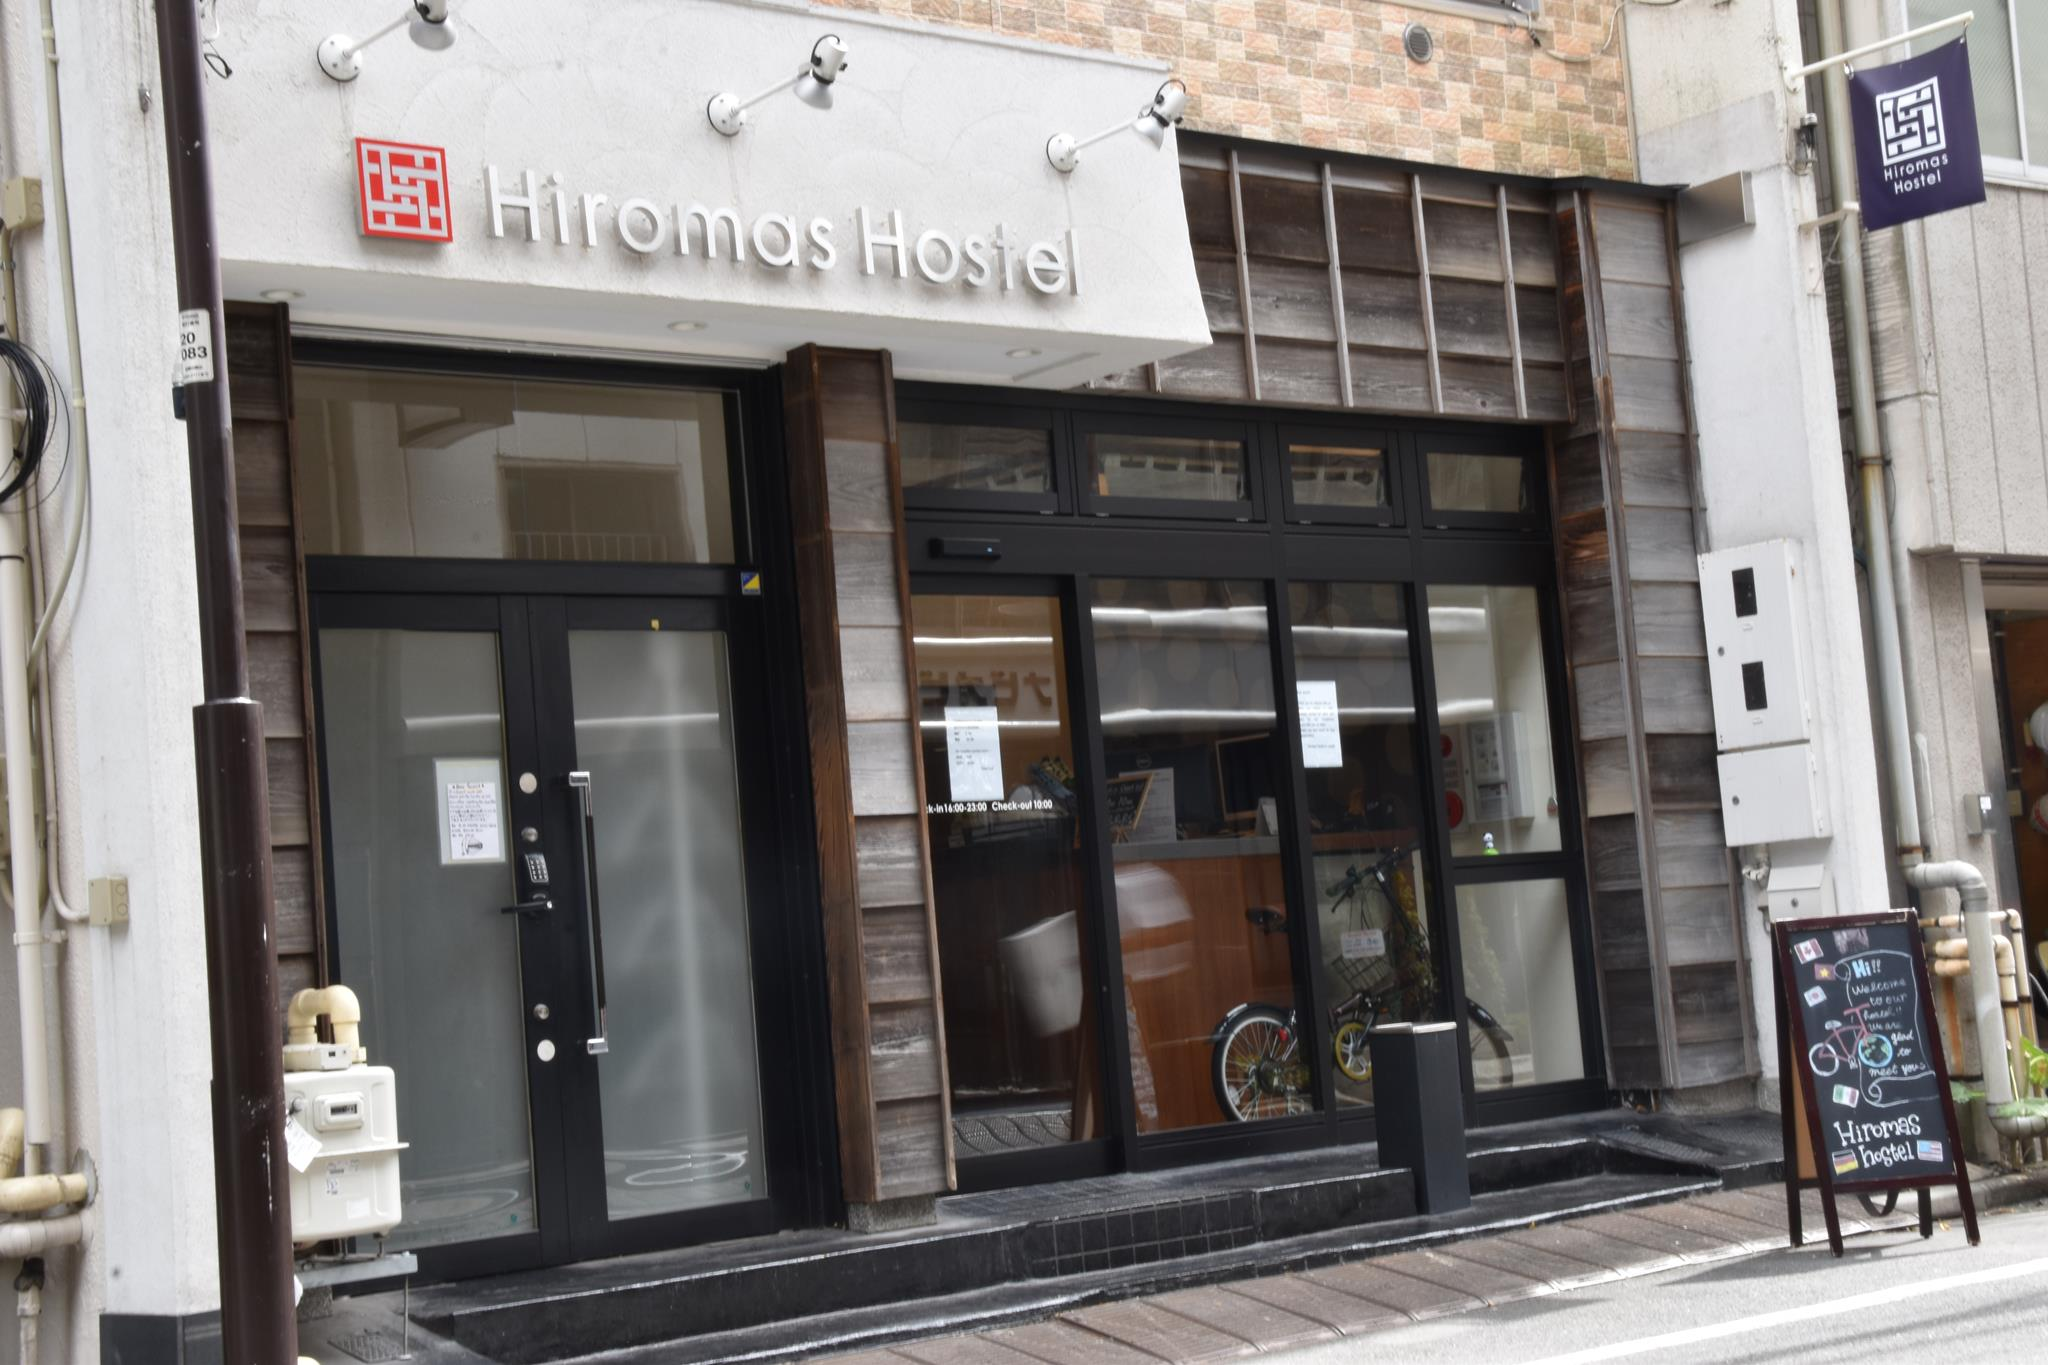 MOA HOSTEL(モア ホステル)in Kanda